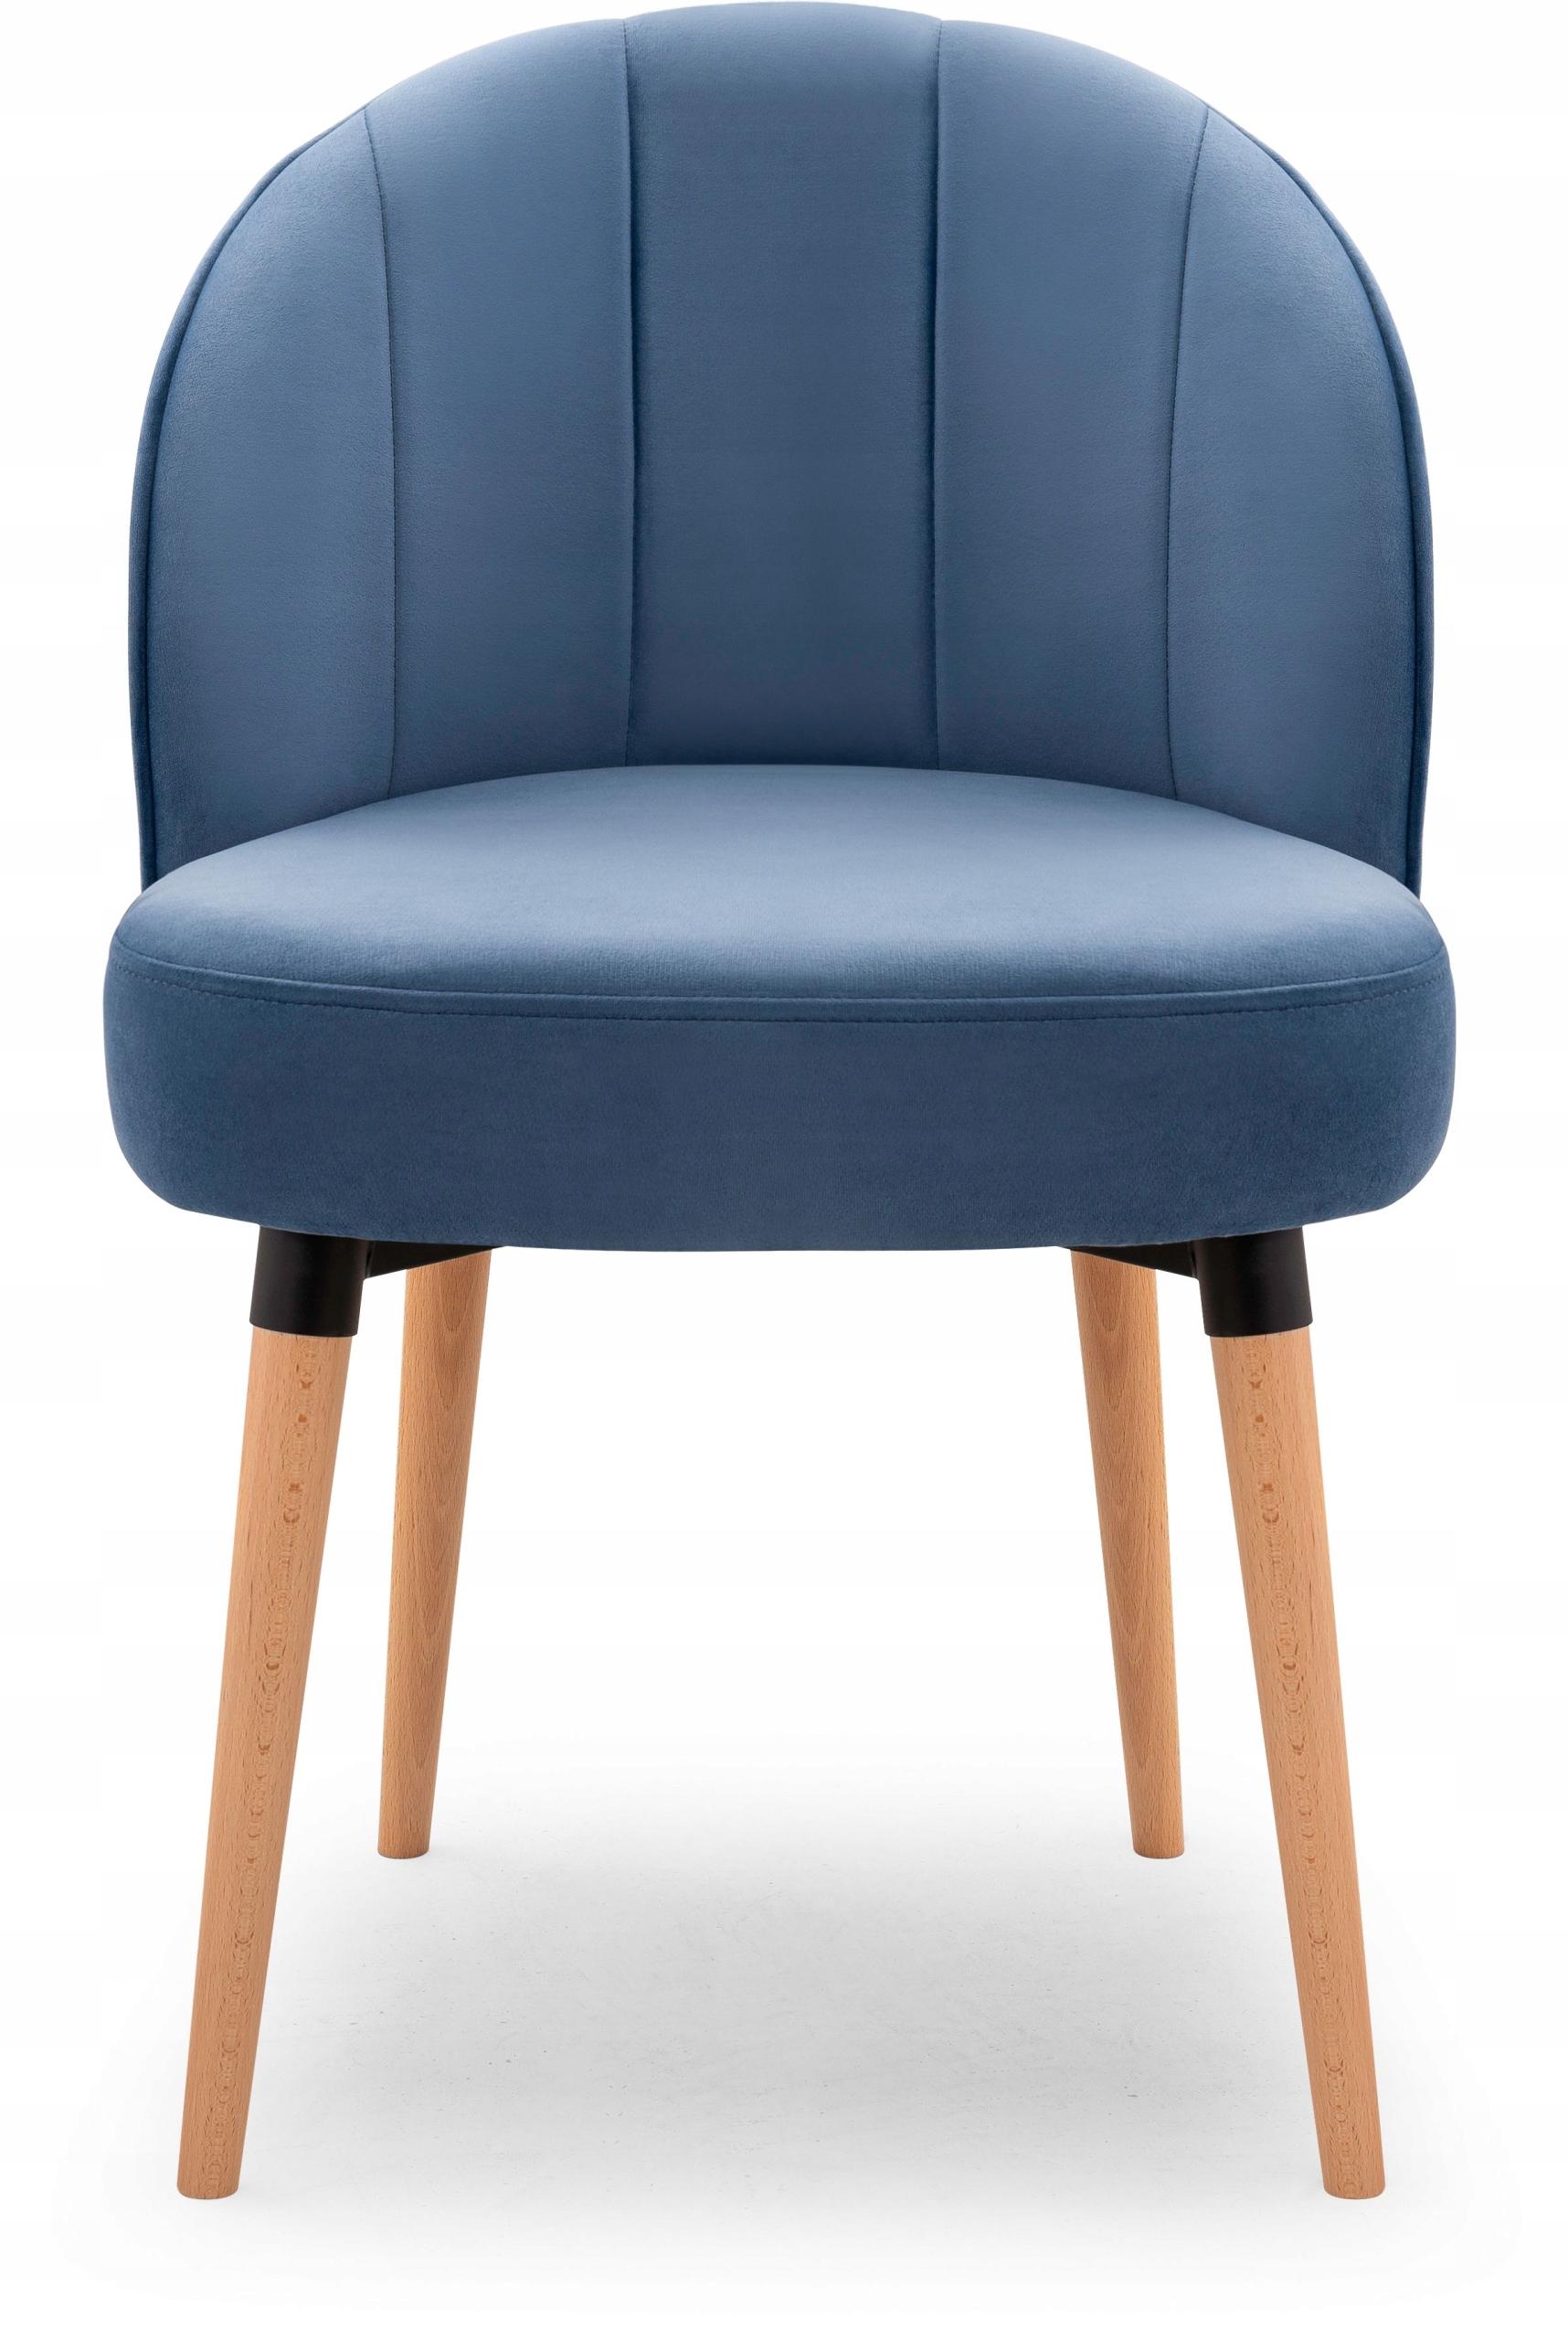 RICK stolička retro dizajn glamour modern PL